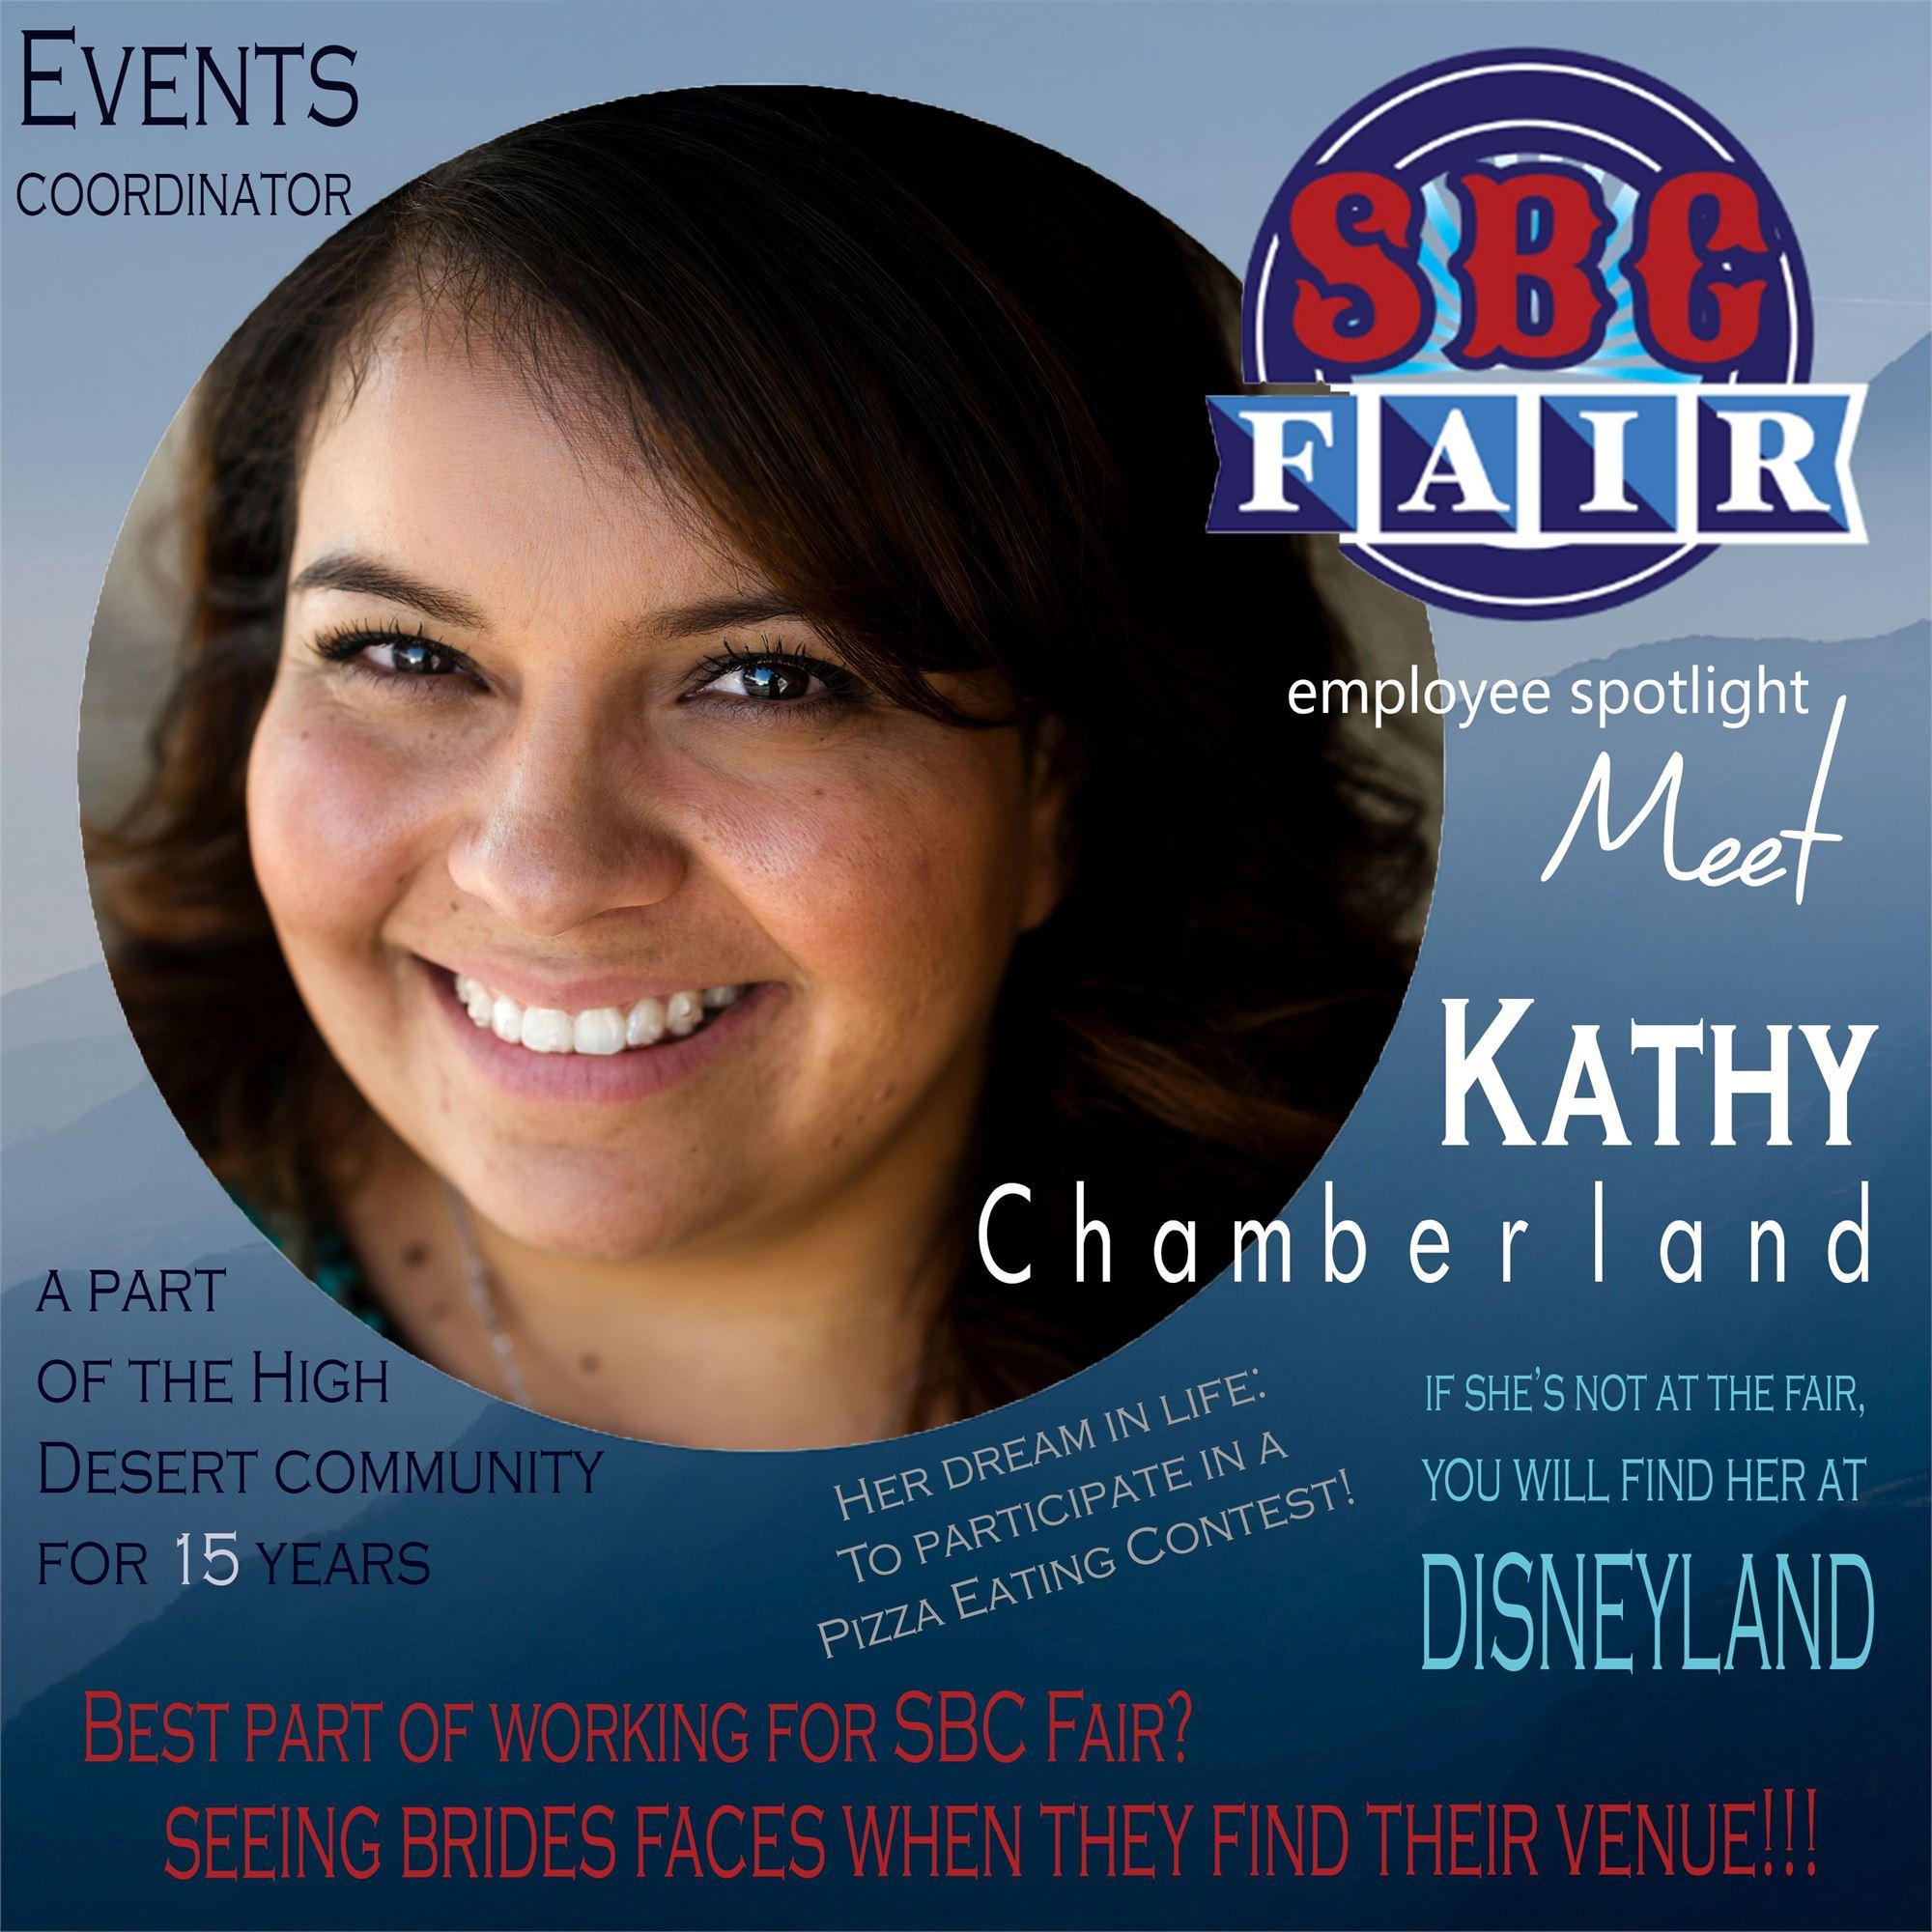 Katherine Chamberland